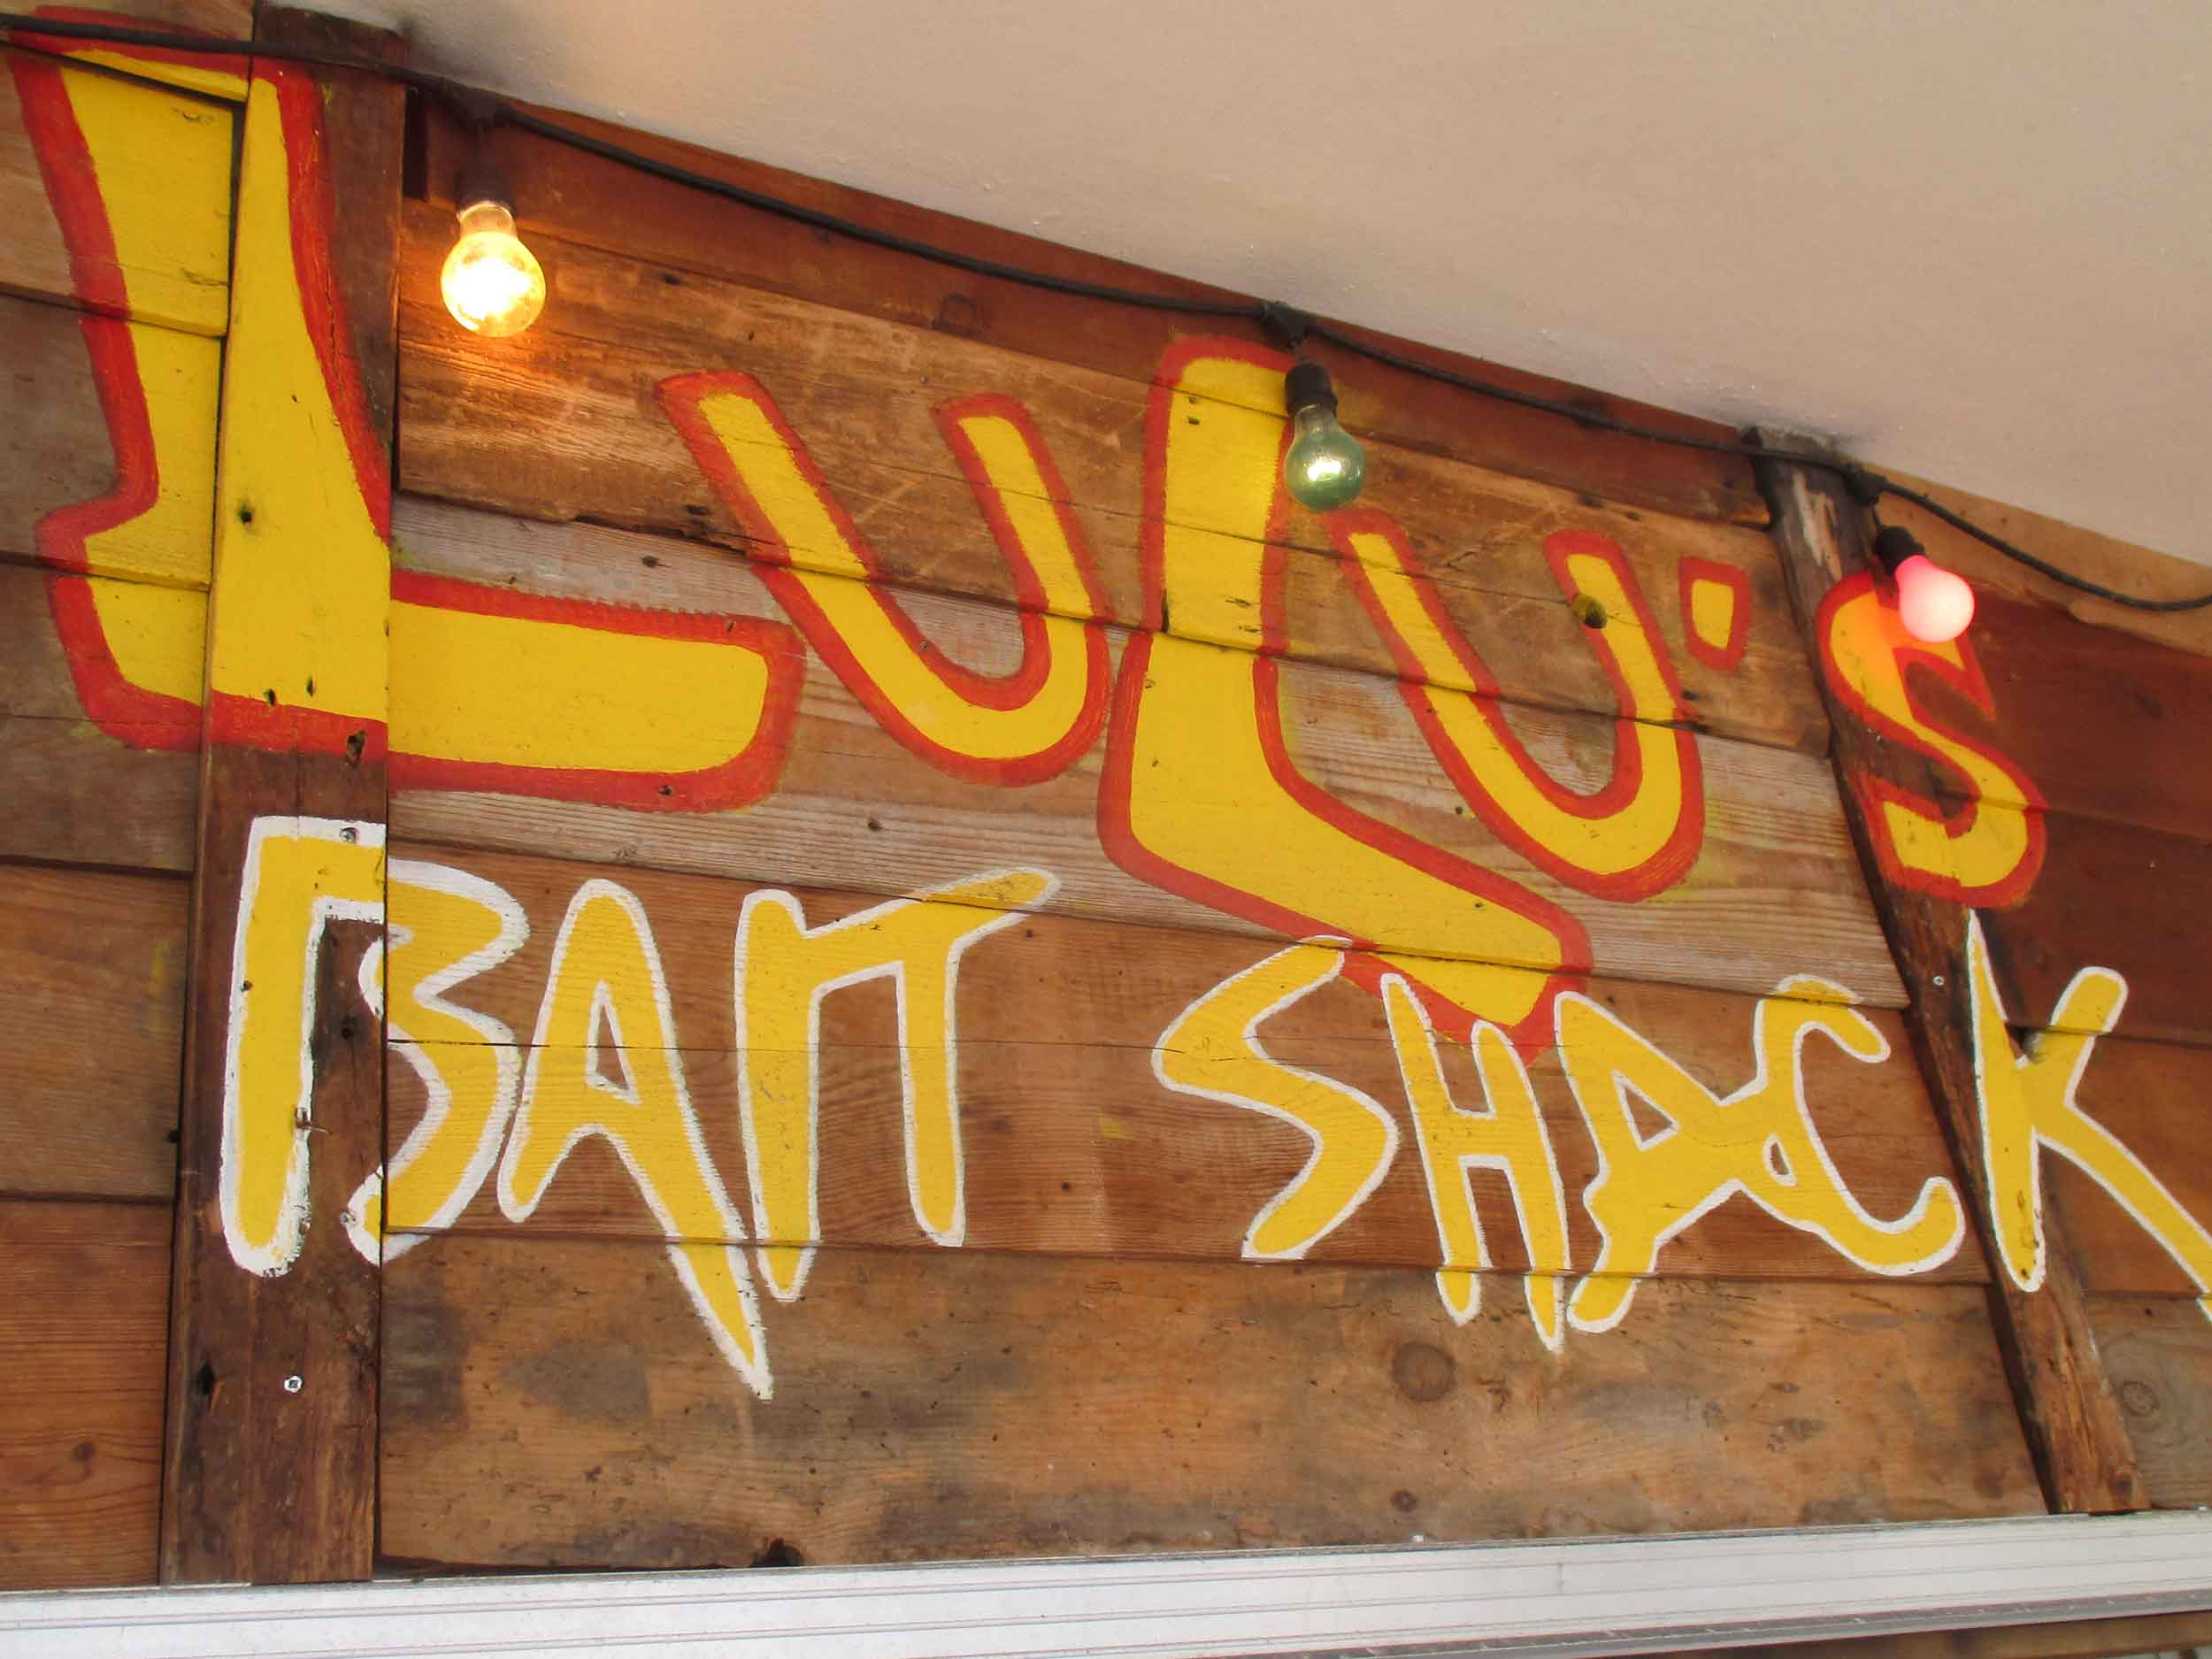 Lulu's Bait Shack Sign